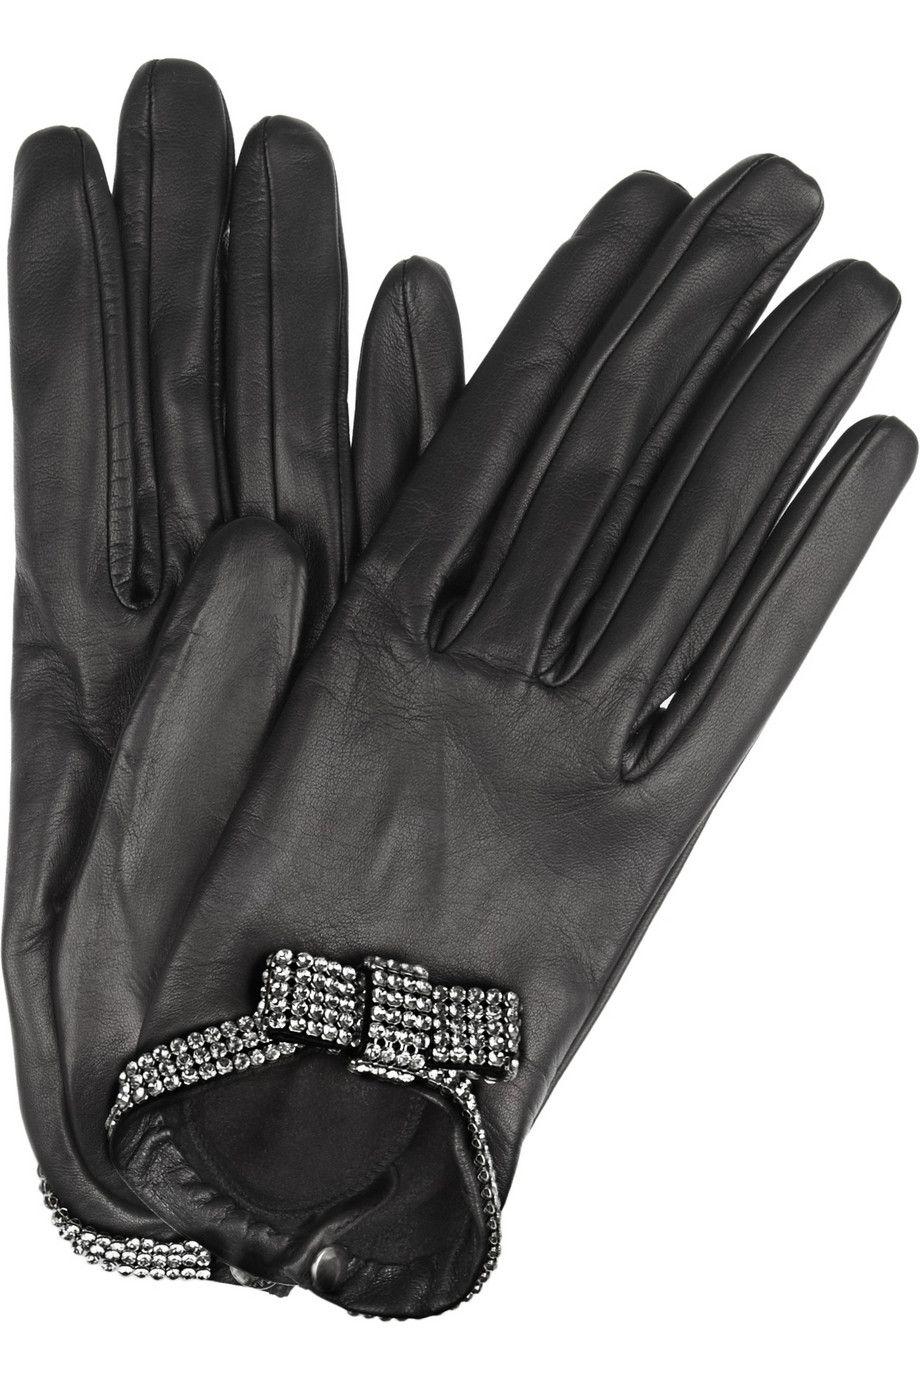 Evening-Gloves-0873